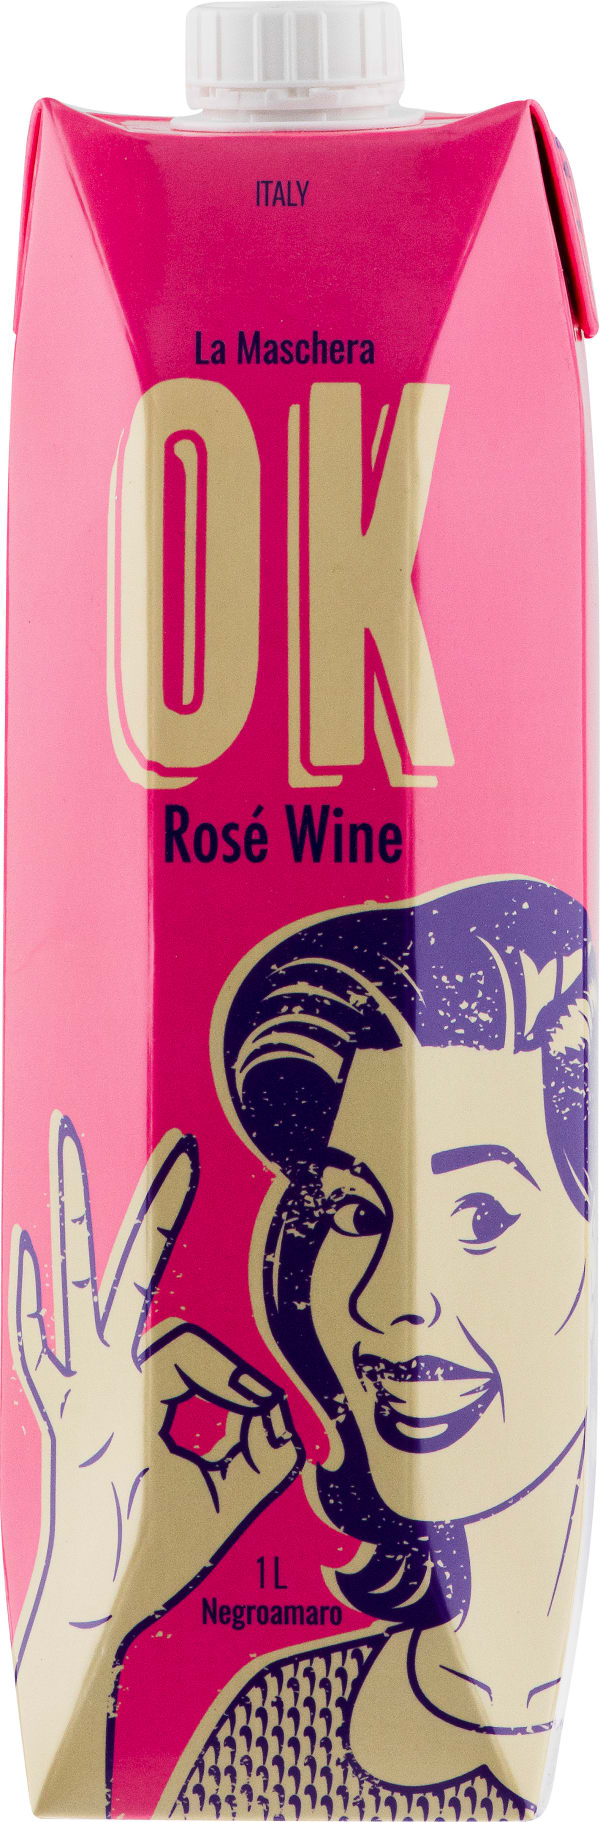 La Maschera Ok Rose 2020 carton package